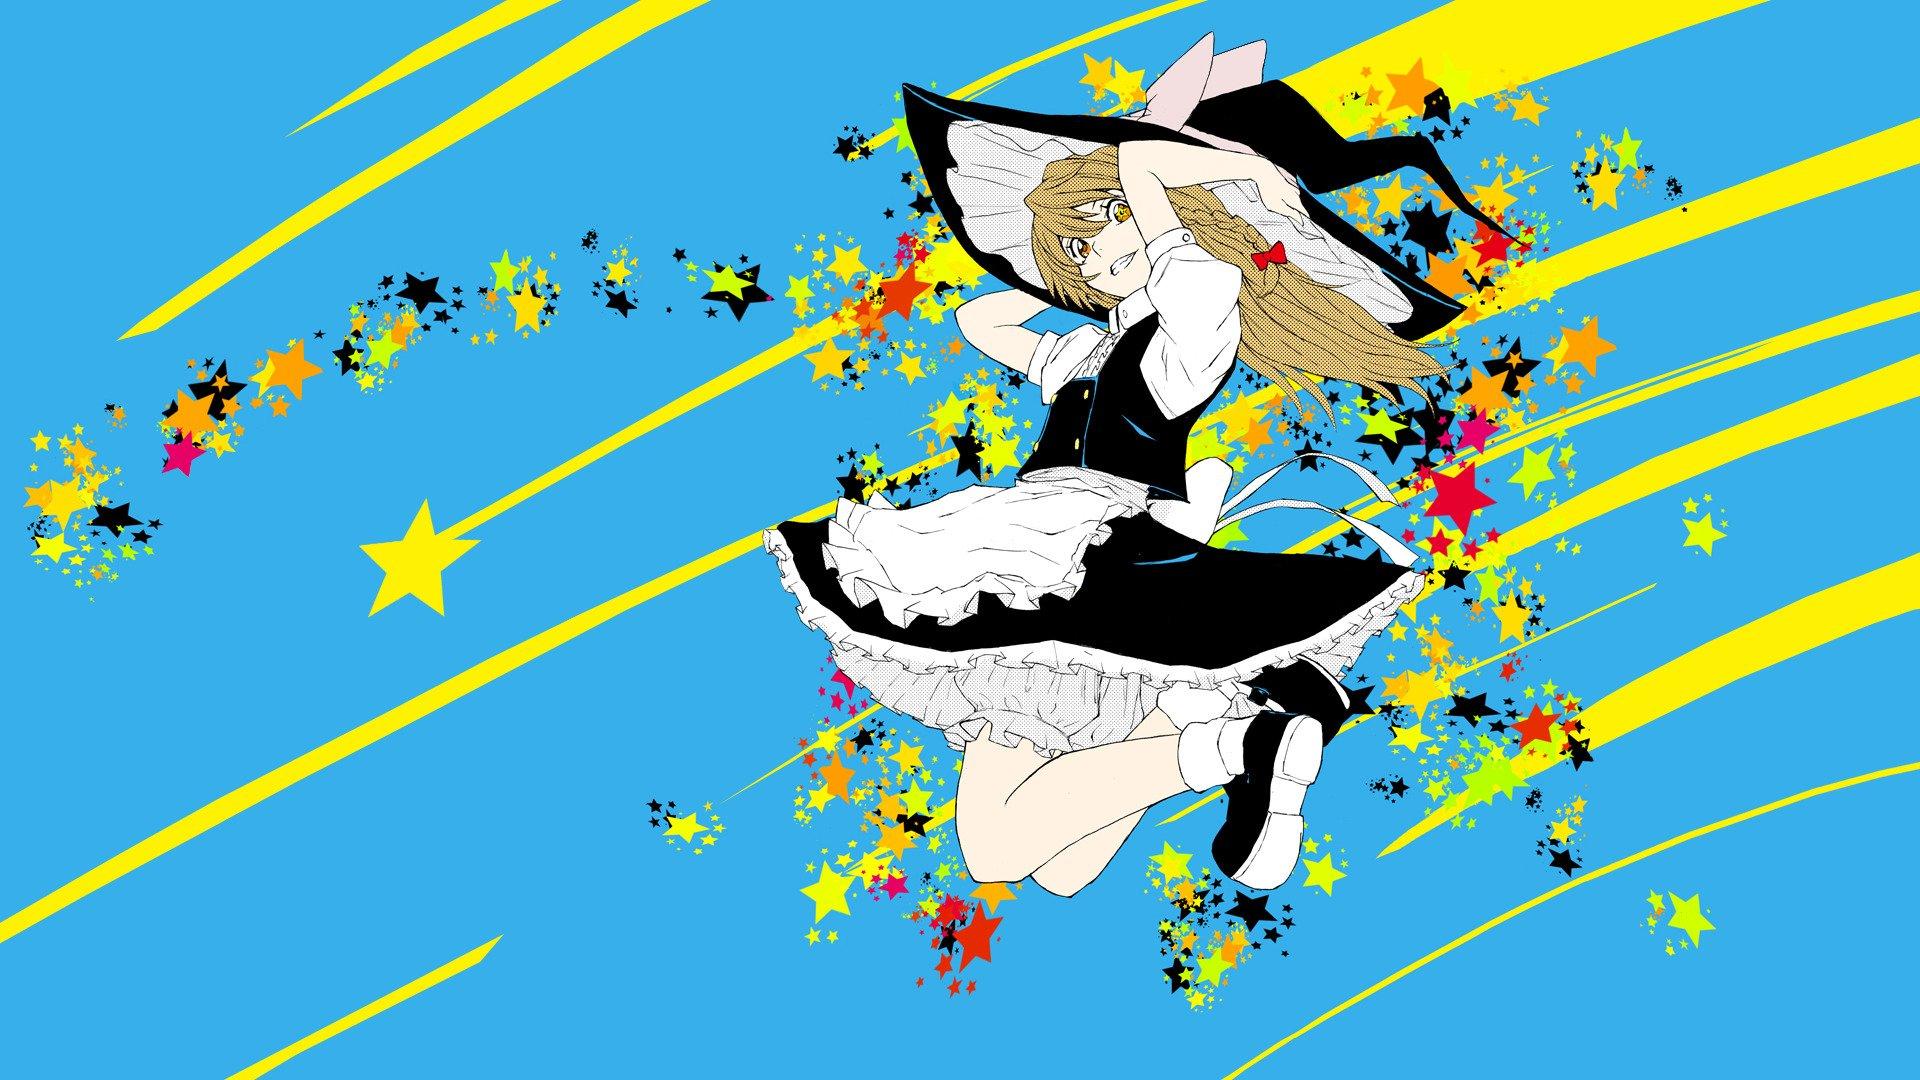 Anime colorful touhou kirisame marisa hd wallpapers - Anime wallpaper mobile hd ...